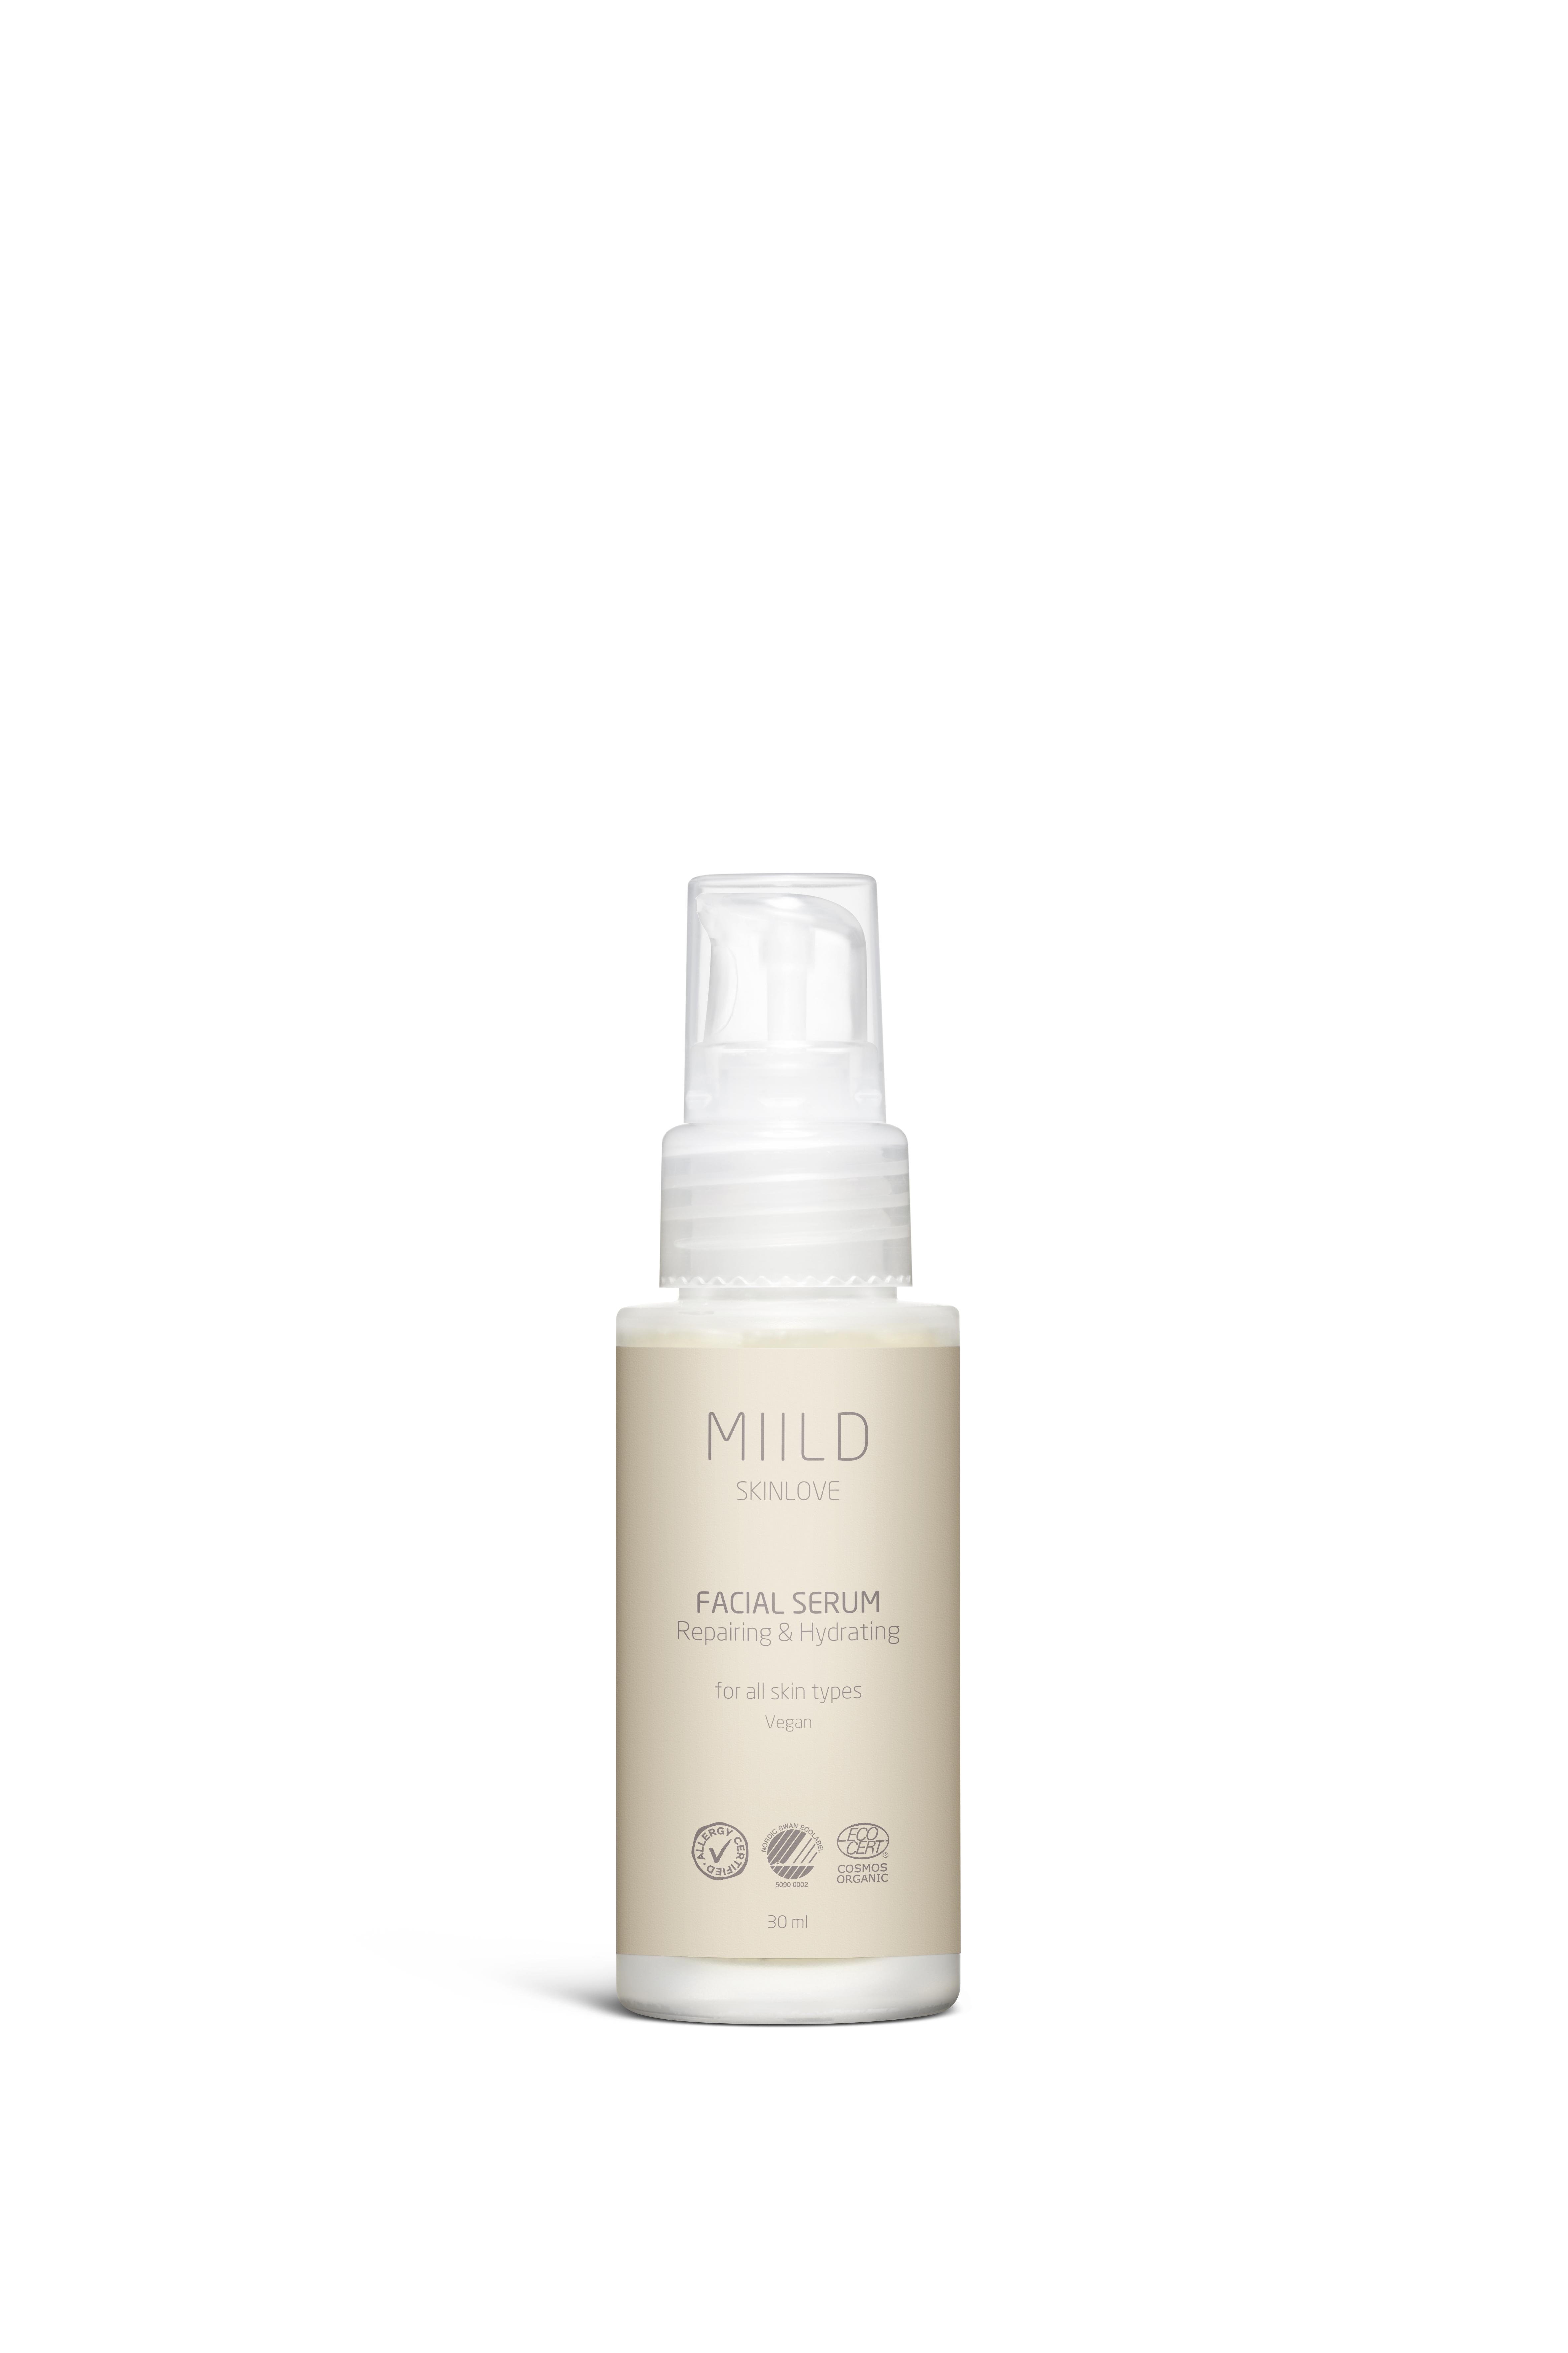 Miild Repairing & Hydrating Facial Serum, 30 ml